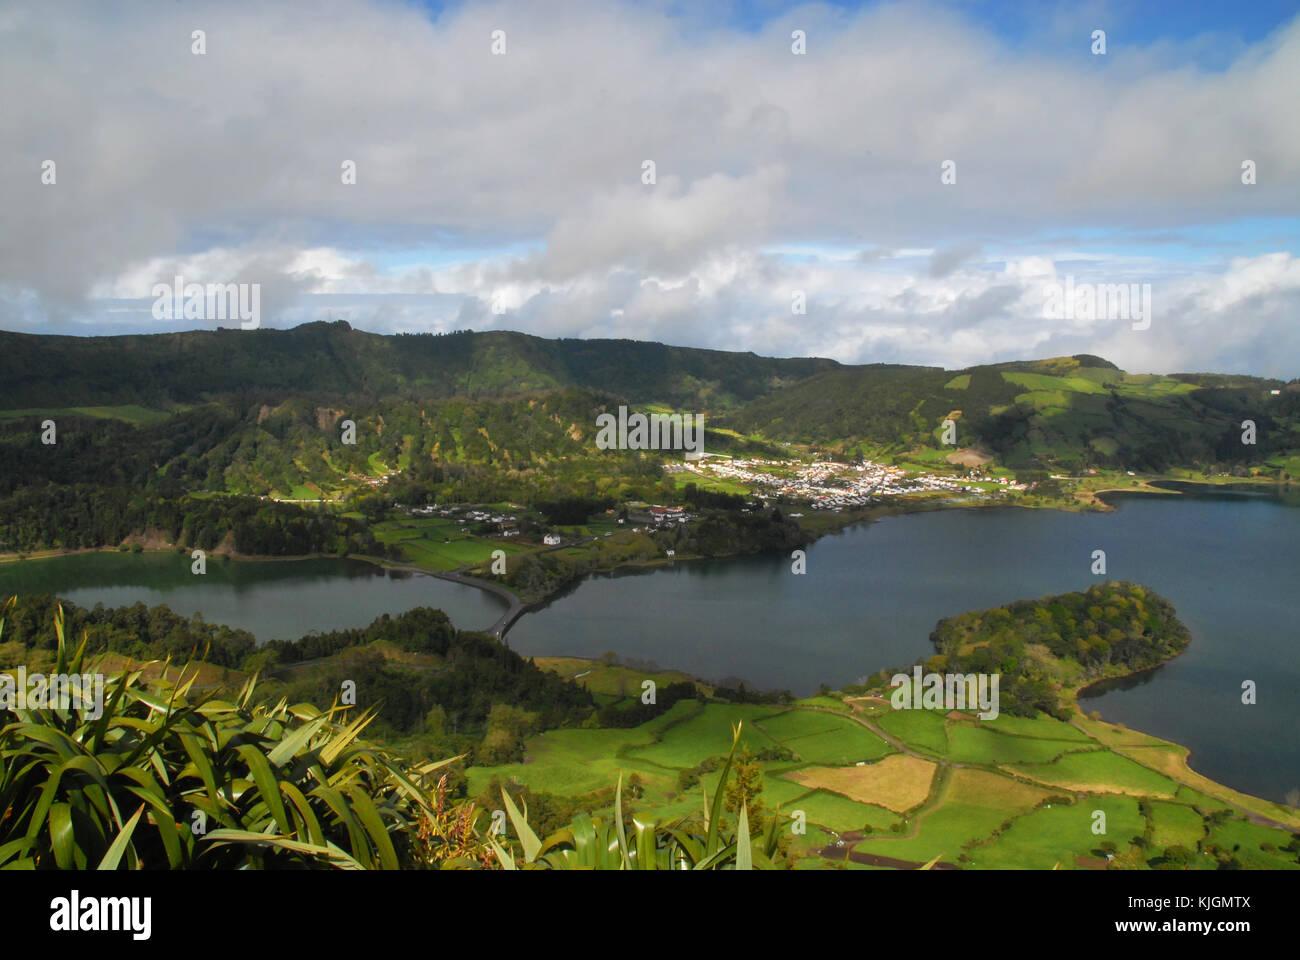 View of Sete Cidades, Lagoa Verde and Lagoa Azul in Sao Miguel, Azores, Portugal Stock Photo